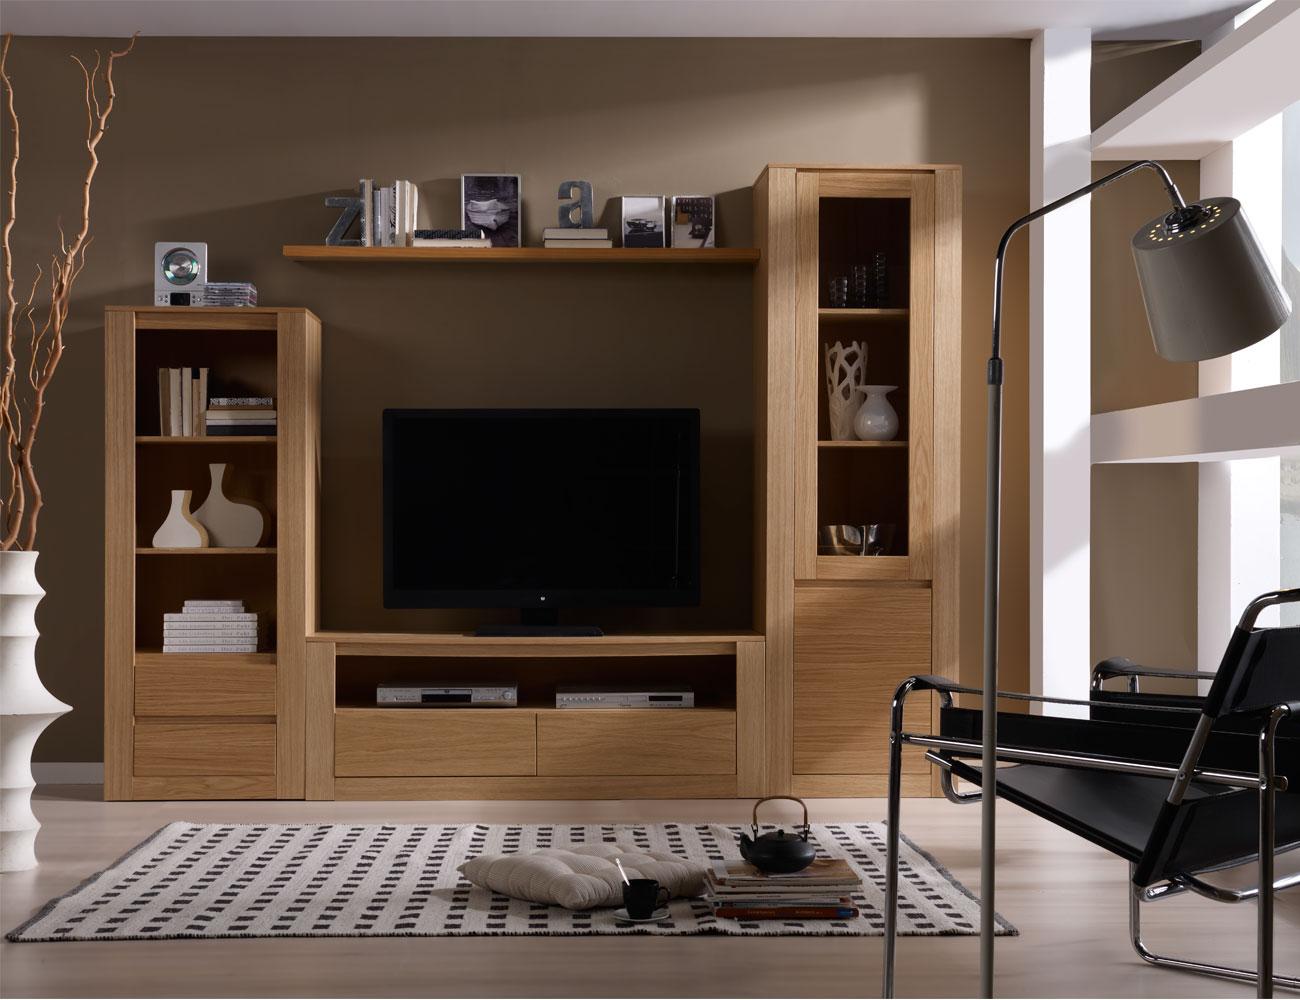 Composicion 3 mueble salon comedor detalle1